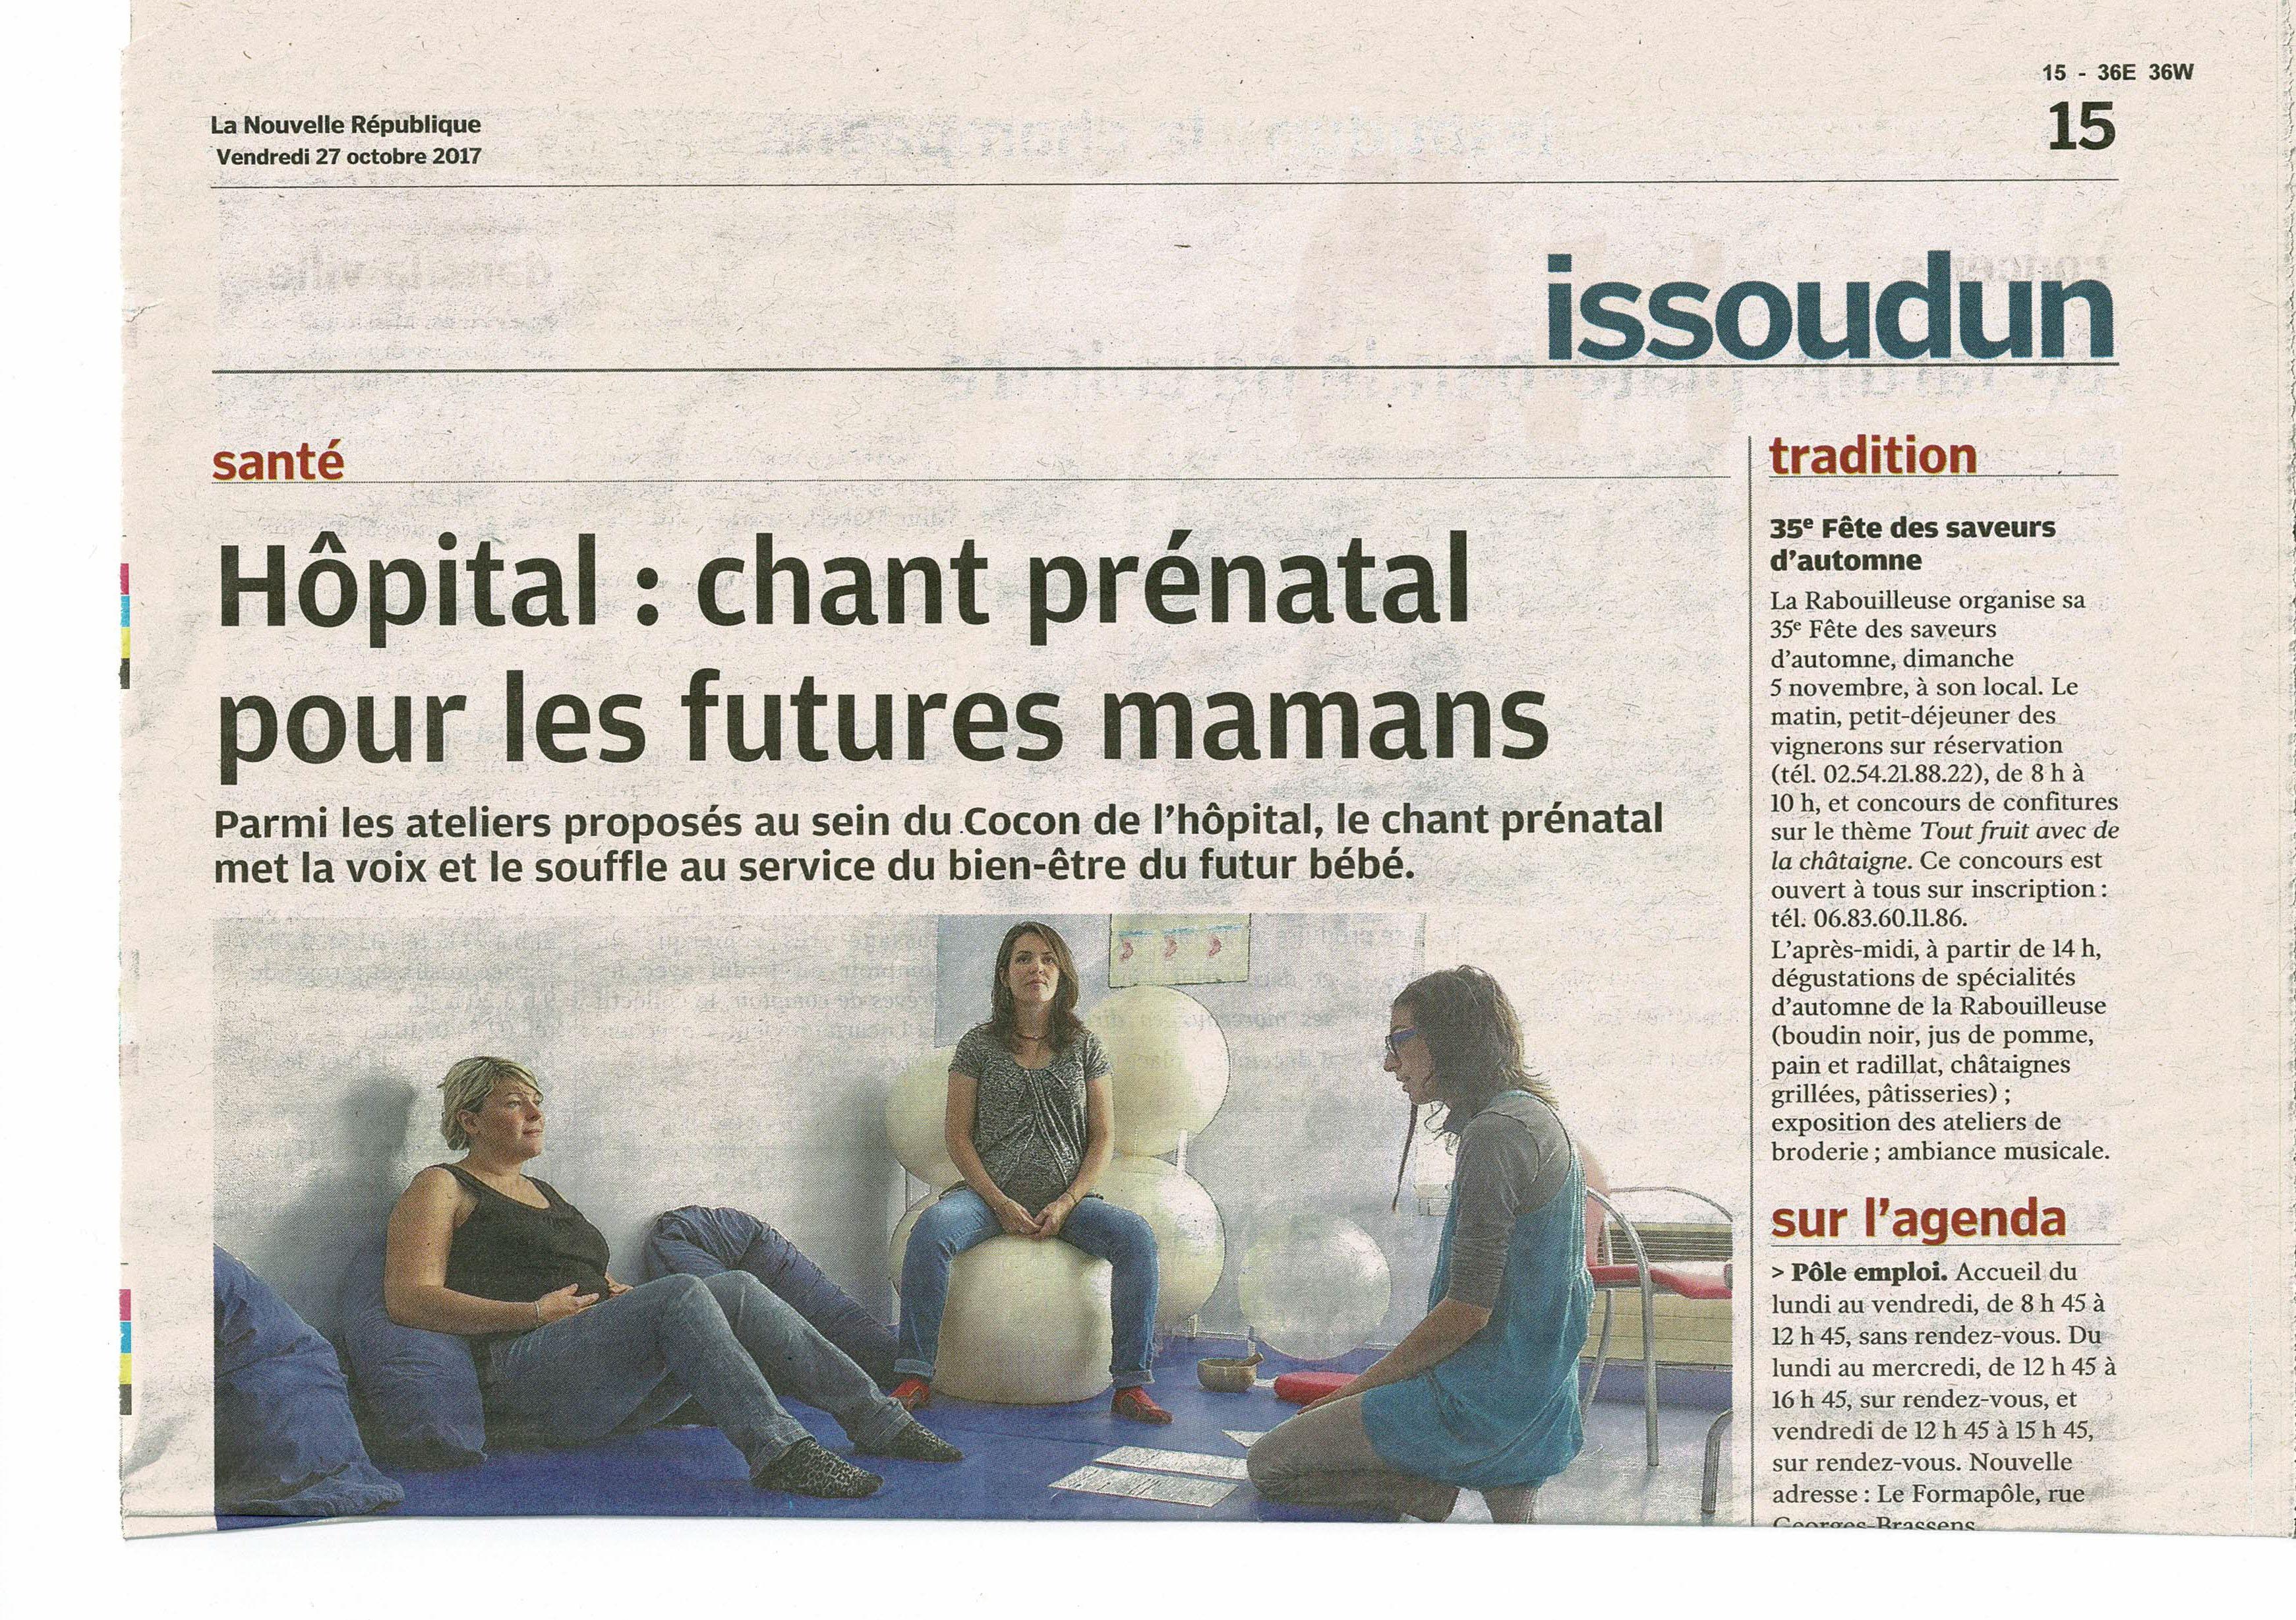 NR_article_Chant prénatal_Issoudun_271017-1